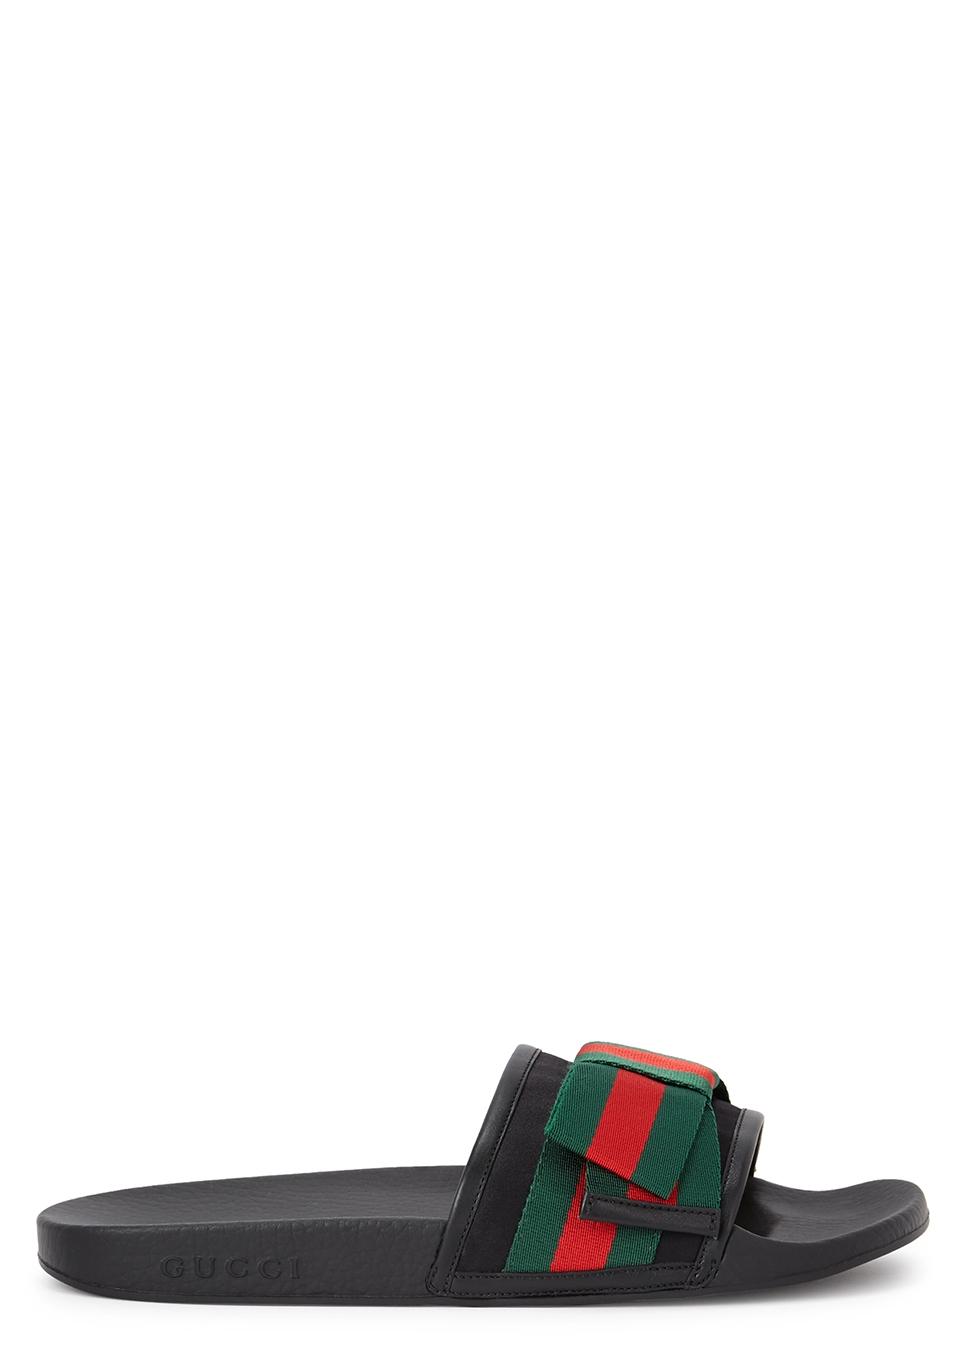 81feca2f97d Gucci Sandals - Womens - Harvey Nichols